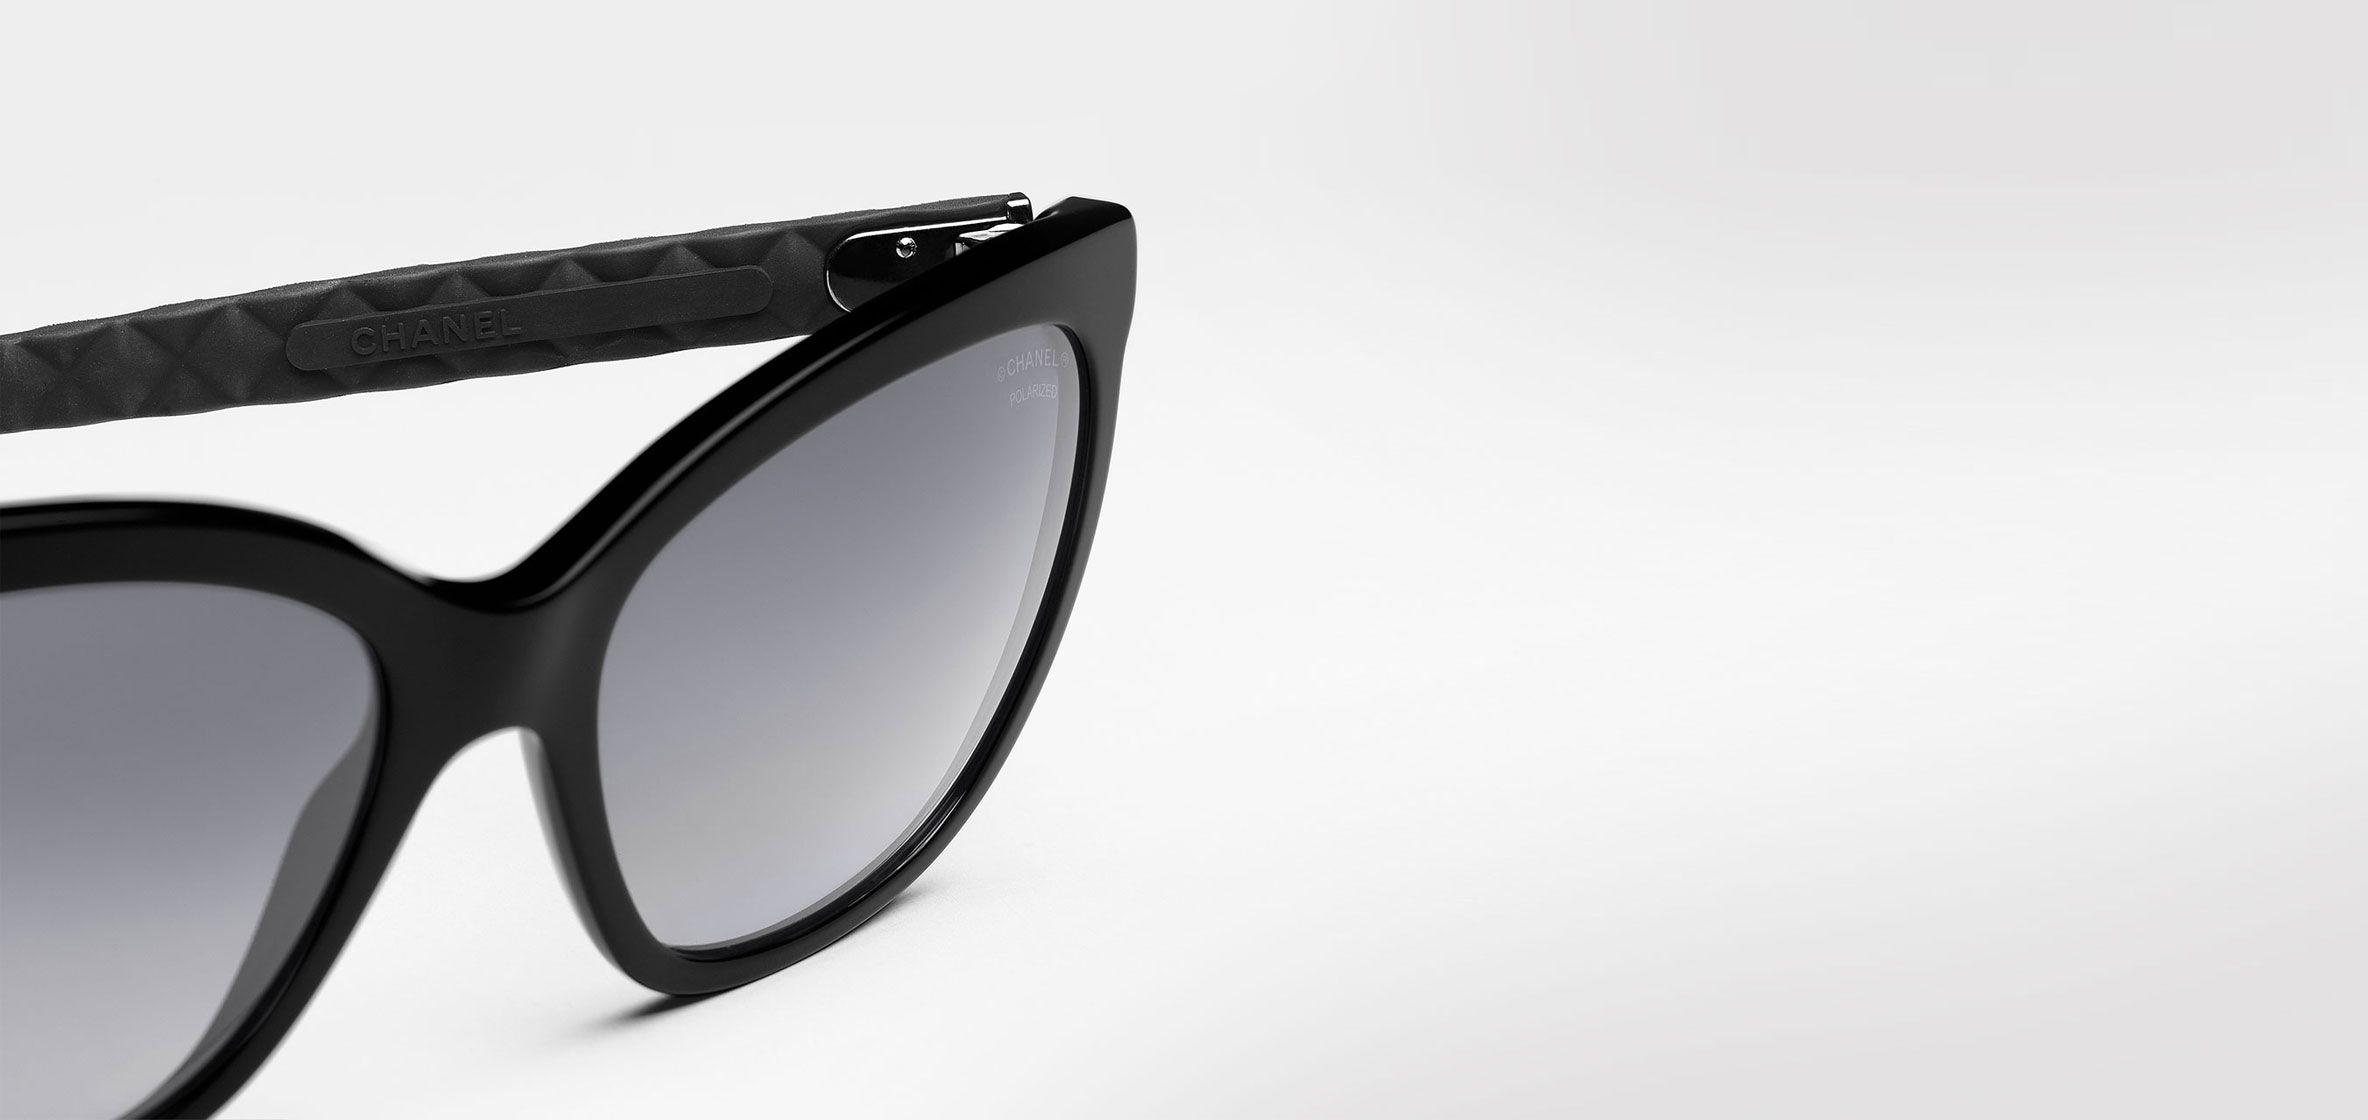 Chanel Sunglasses Black Square Quilting   Online Boutique   Virtual ...